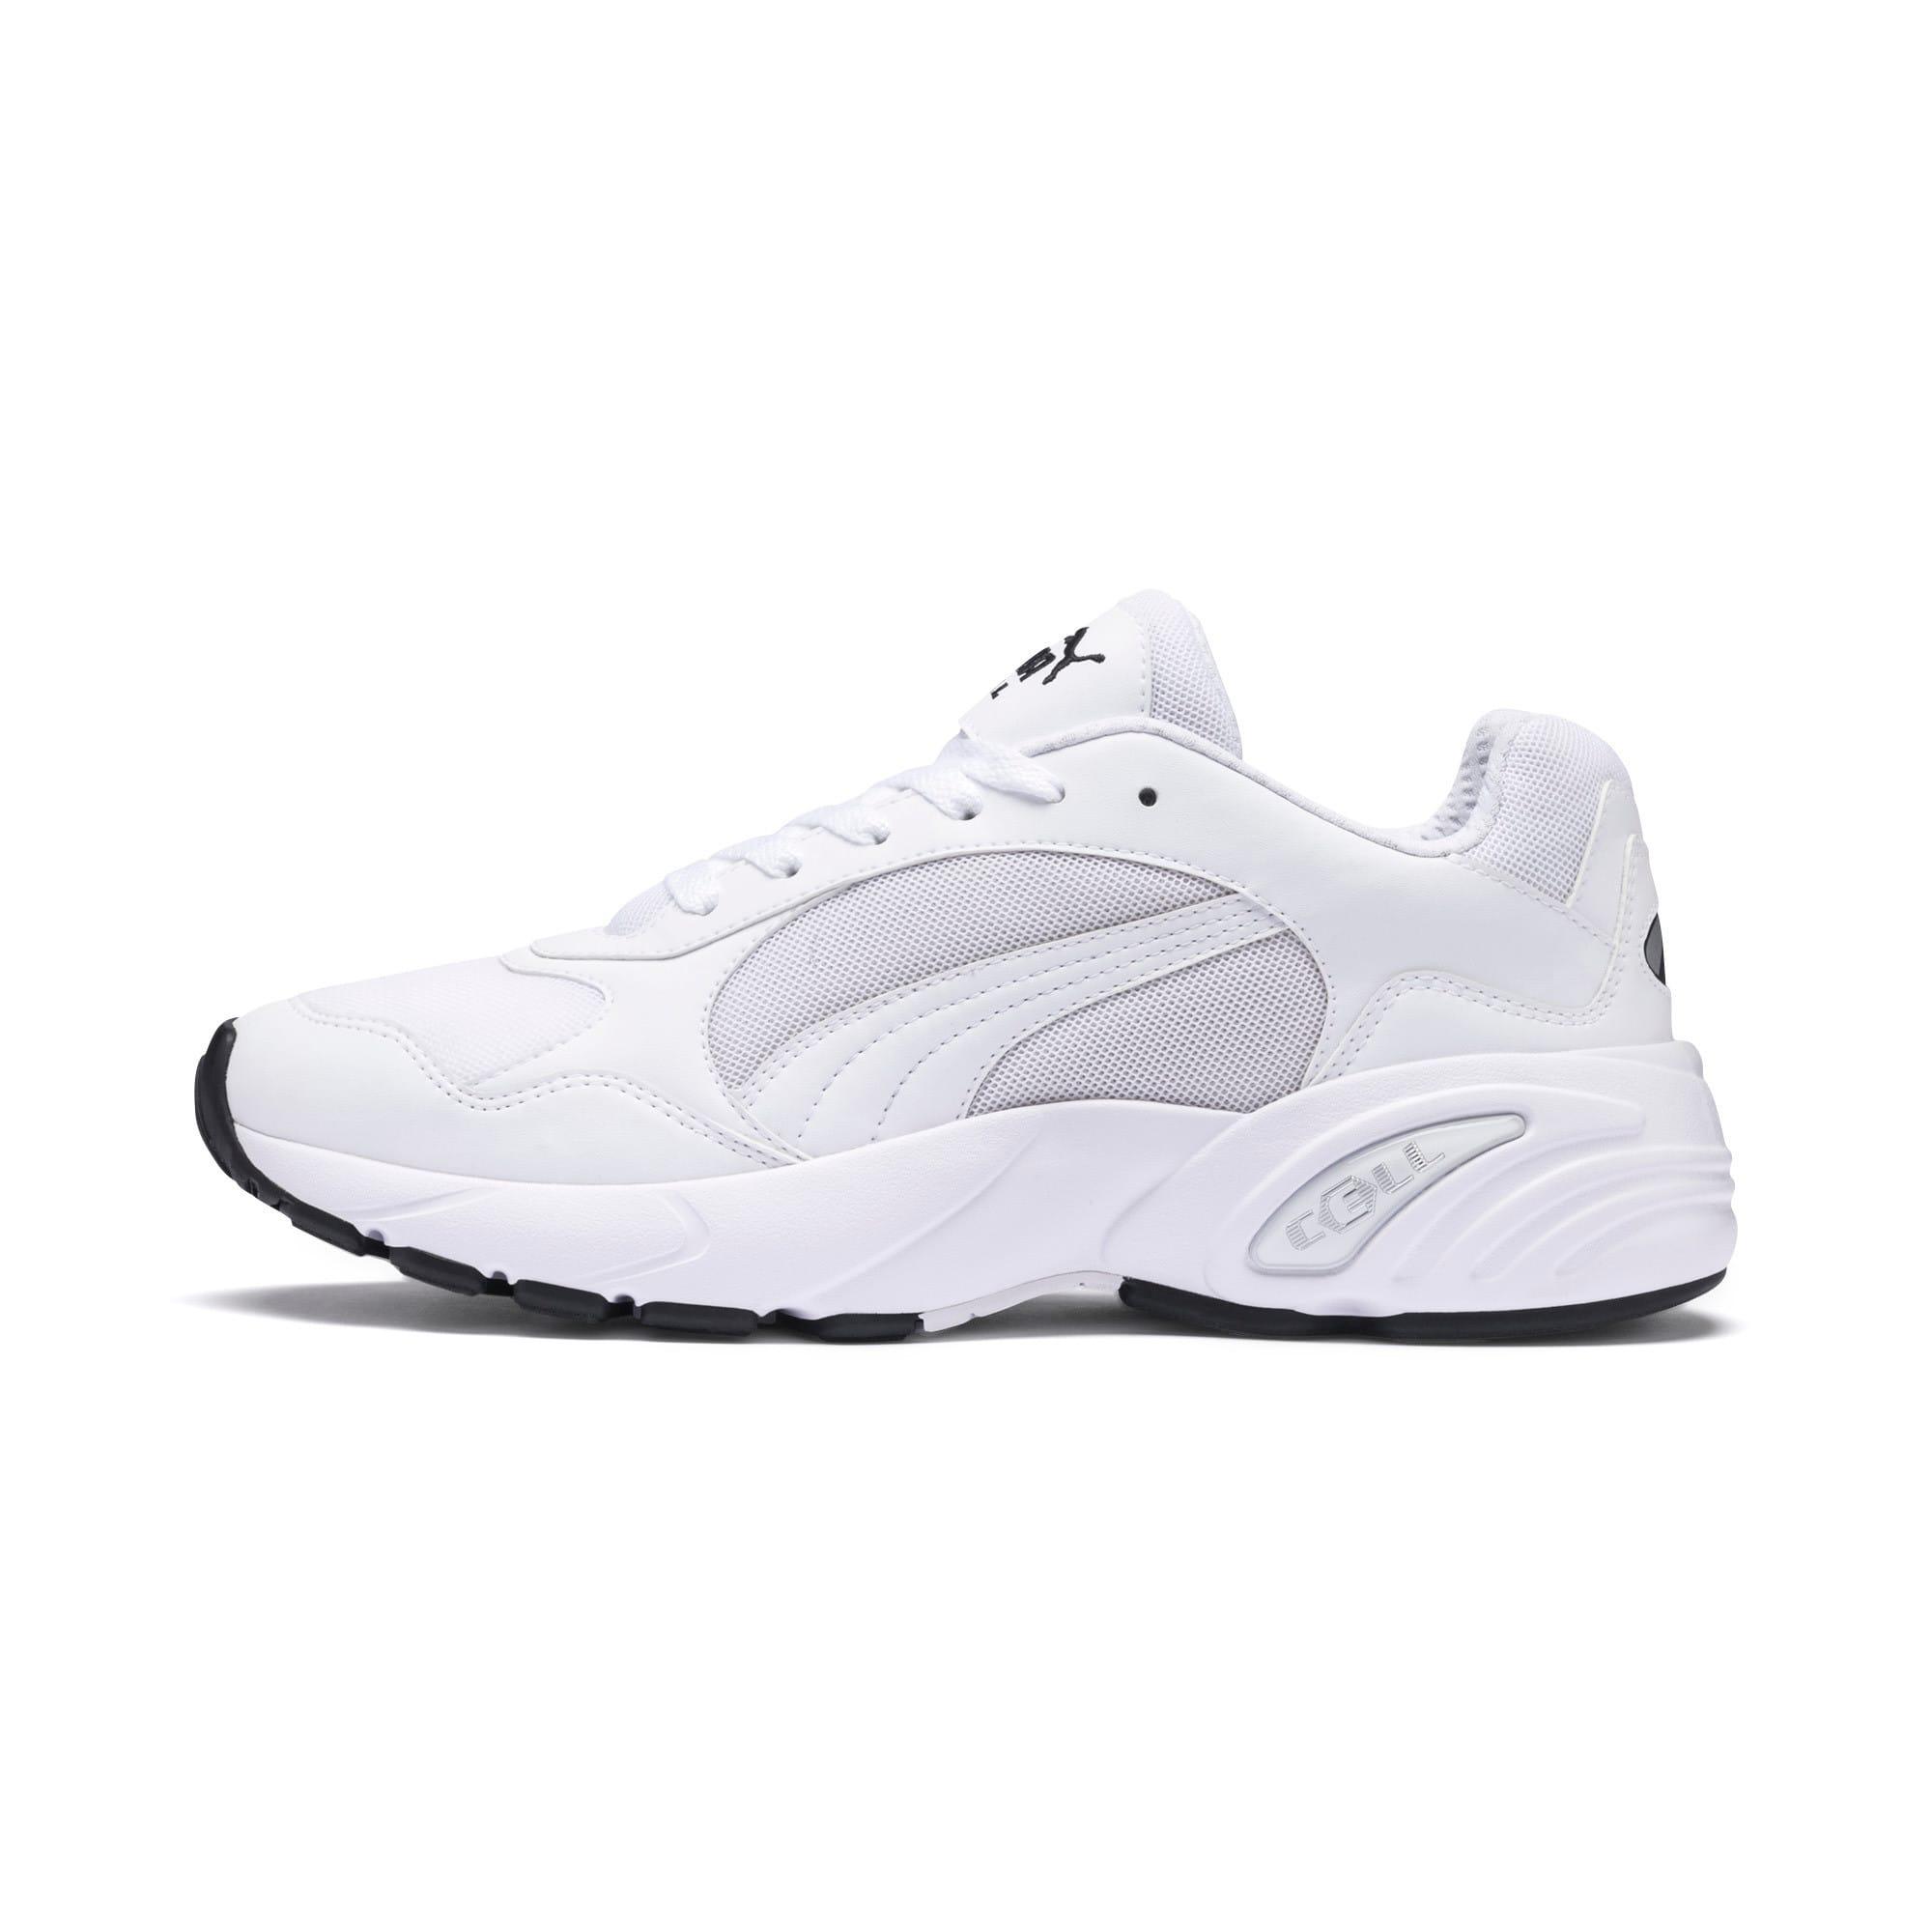 Thumbnail 1 of CELL Viper Sneakers, Puma White-Puma White, medium